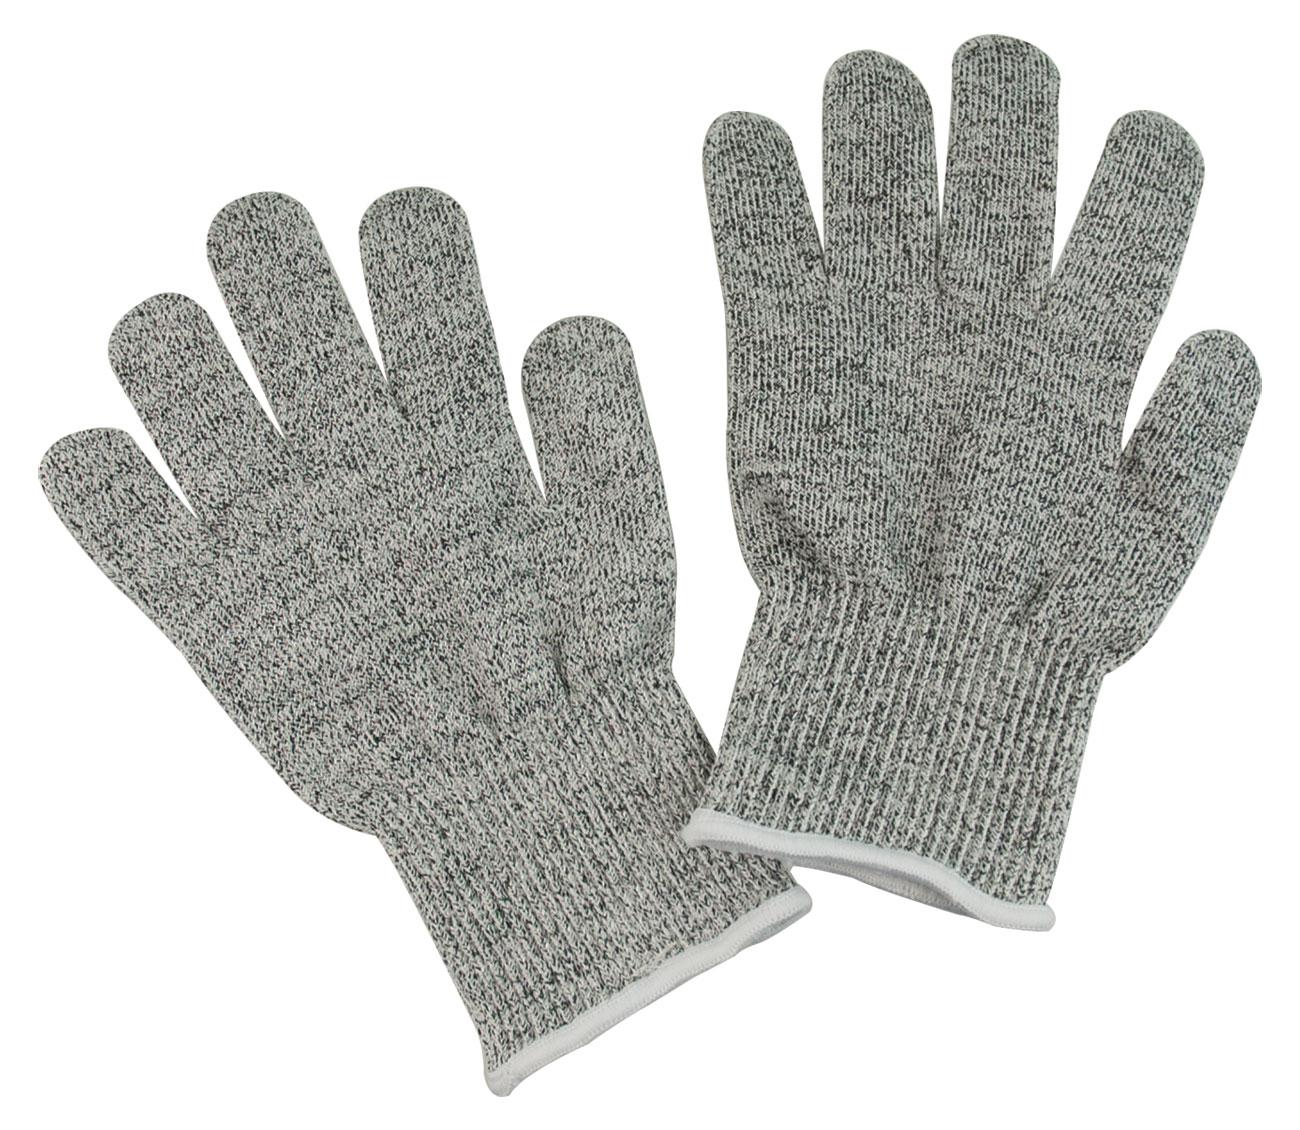 Cut-Resistant Safety Glove- Size XL- 1 Pair